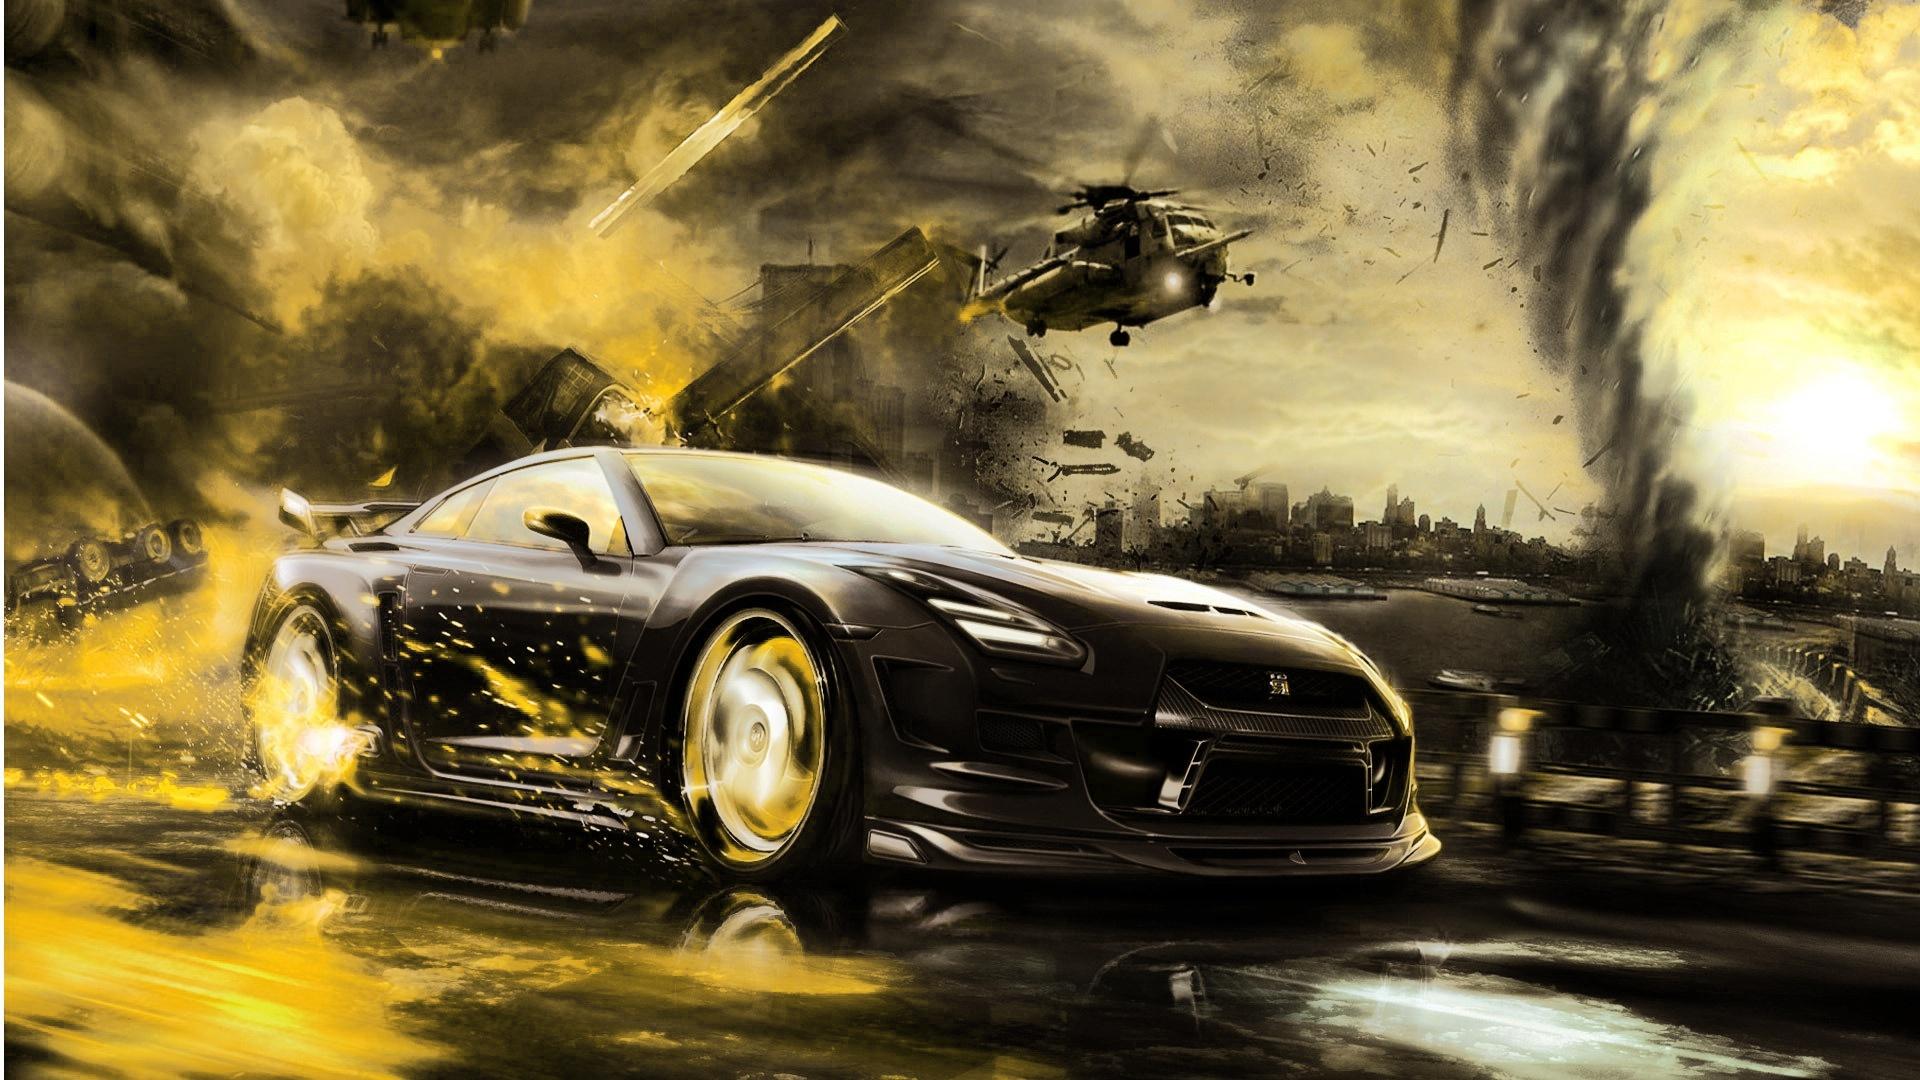 Awesome Cars Wallpaper HD - WallpaperSafari